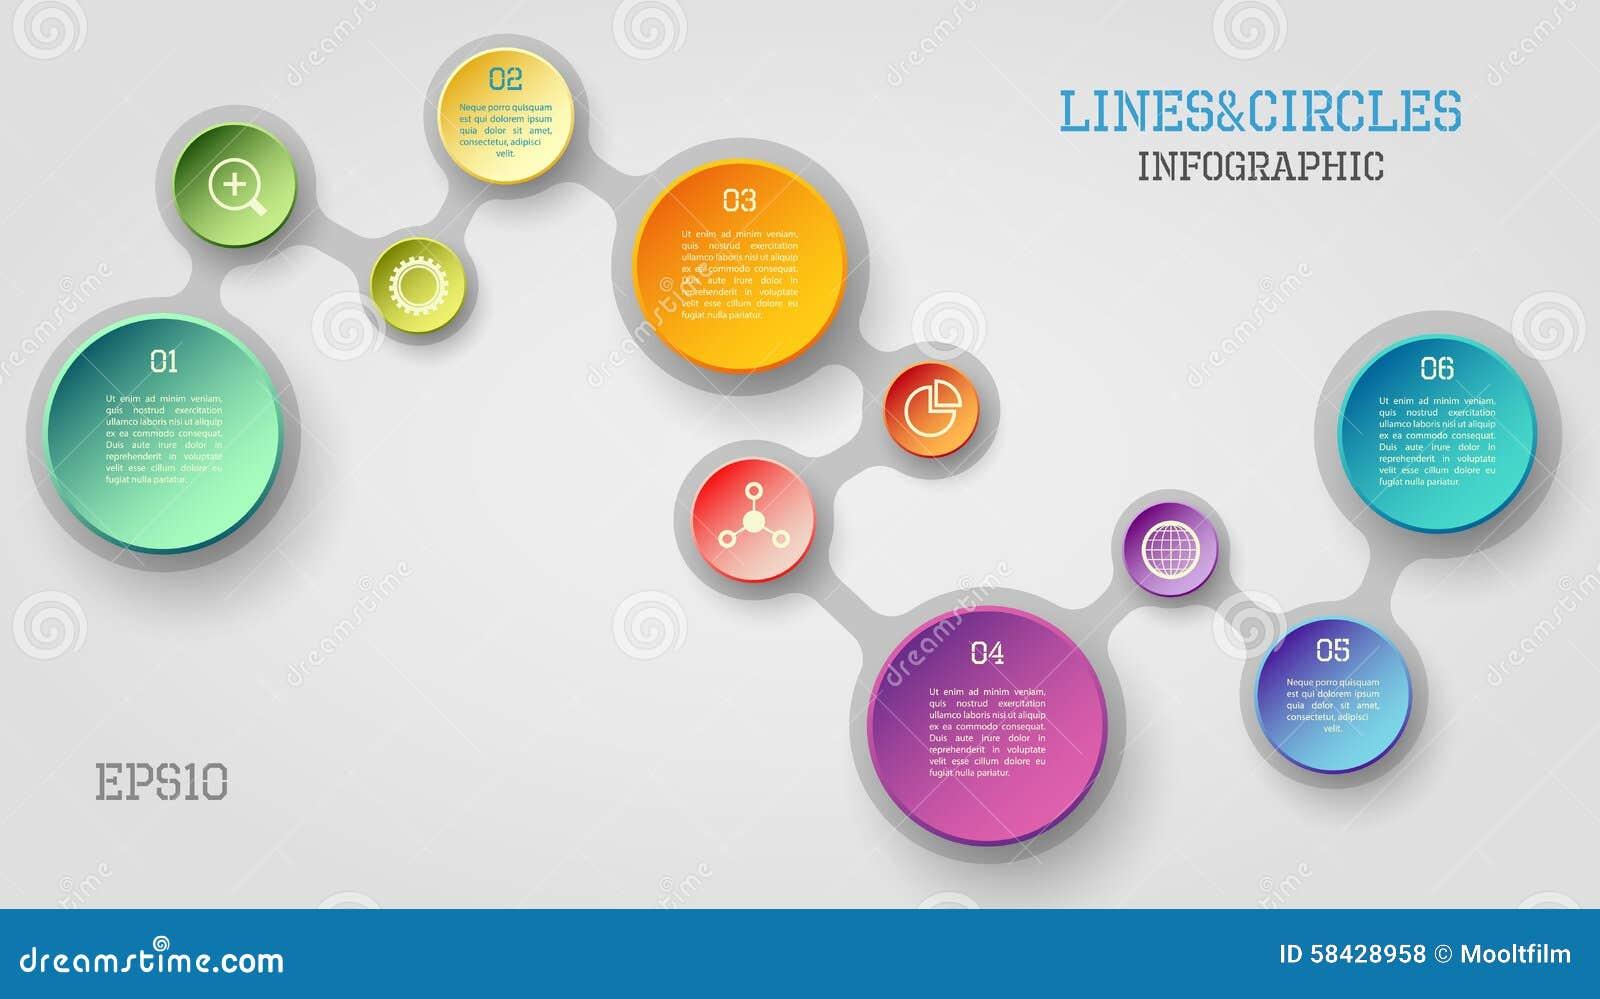 Círculo infographic